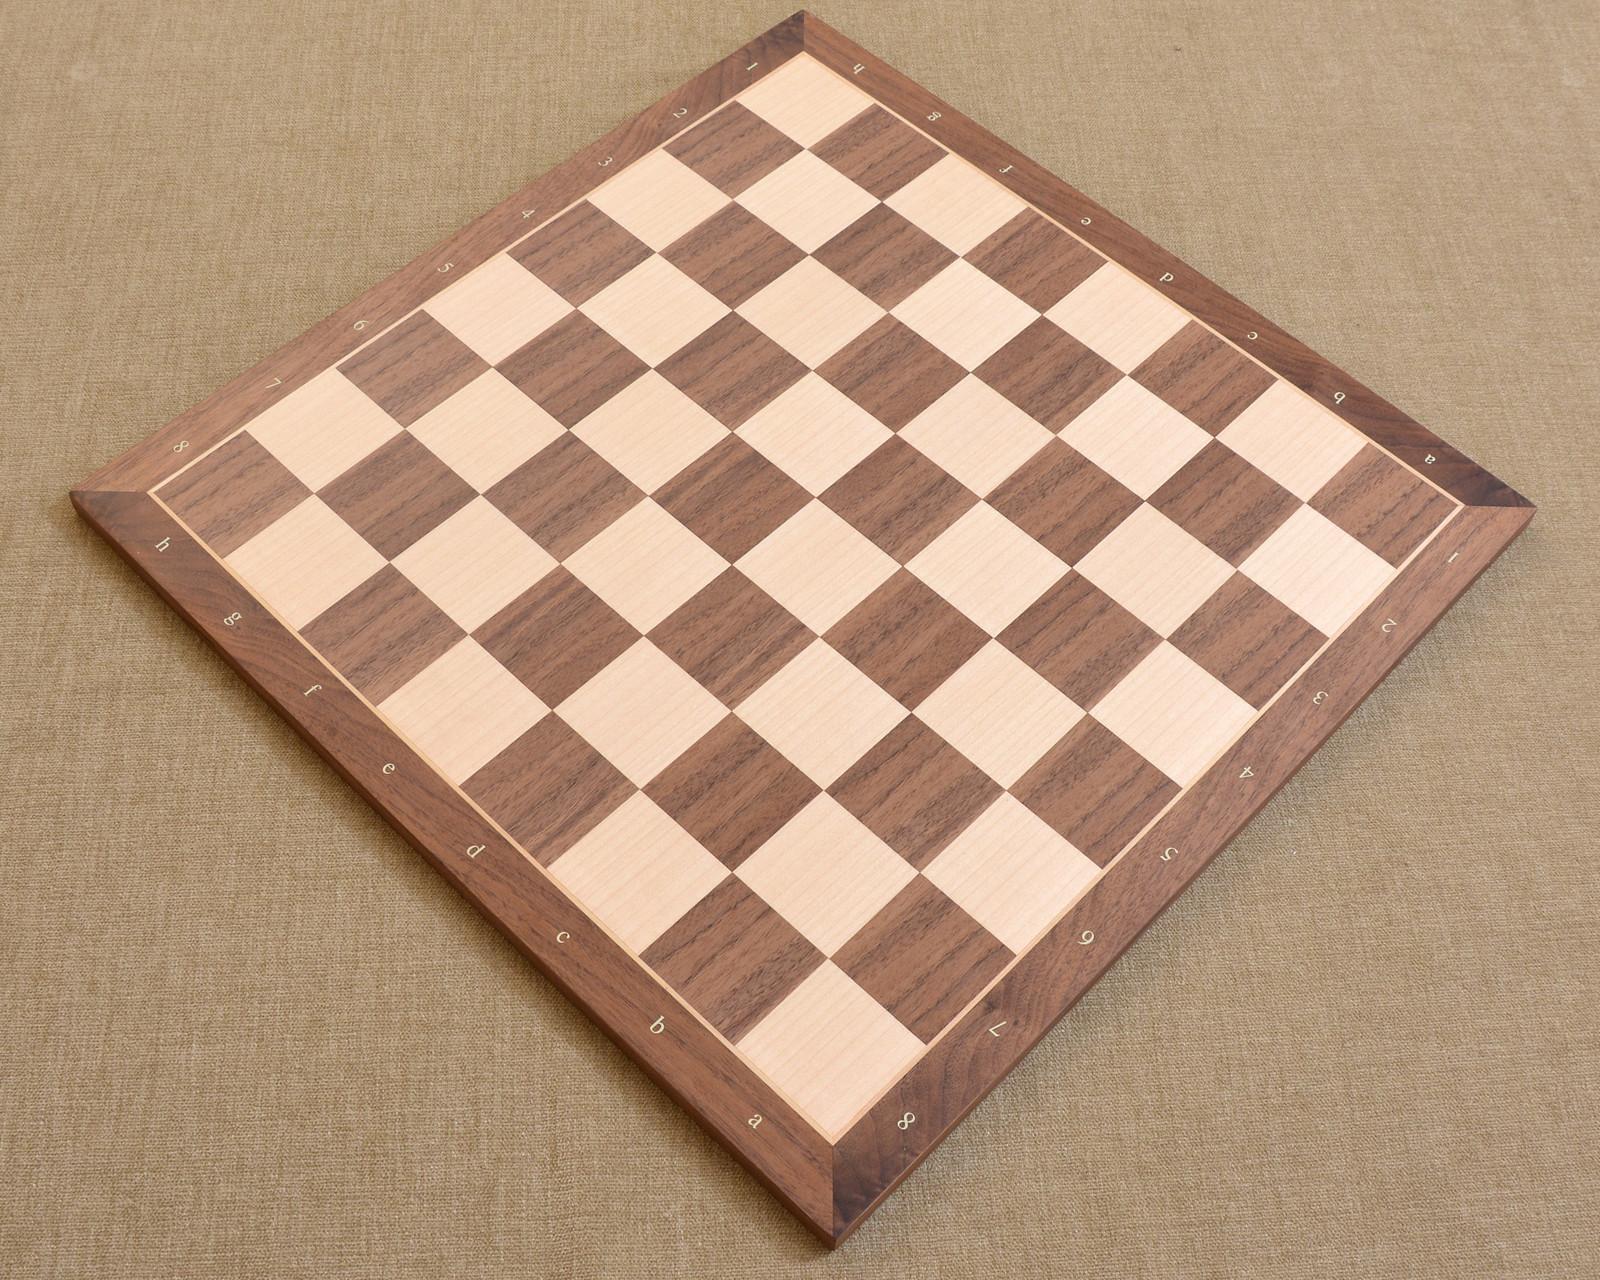 "Standard Walnut Maple Wooden Chess Board with Notation 18"" - 50 mm - SKU: B1017"